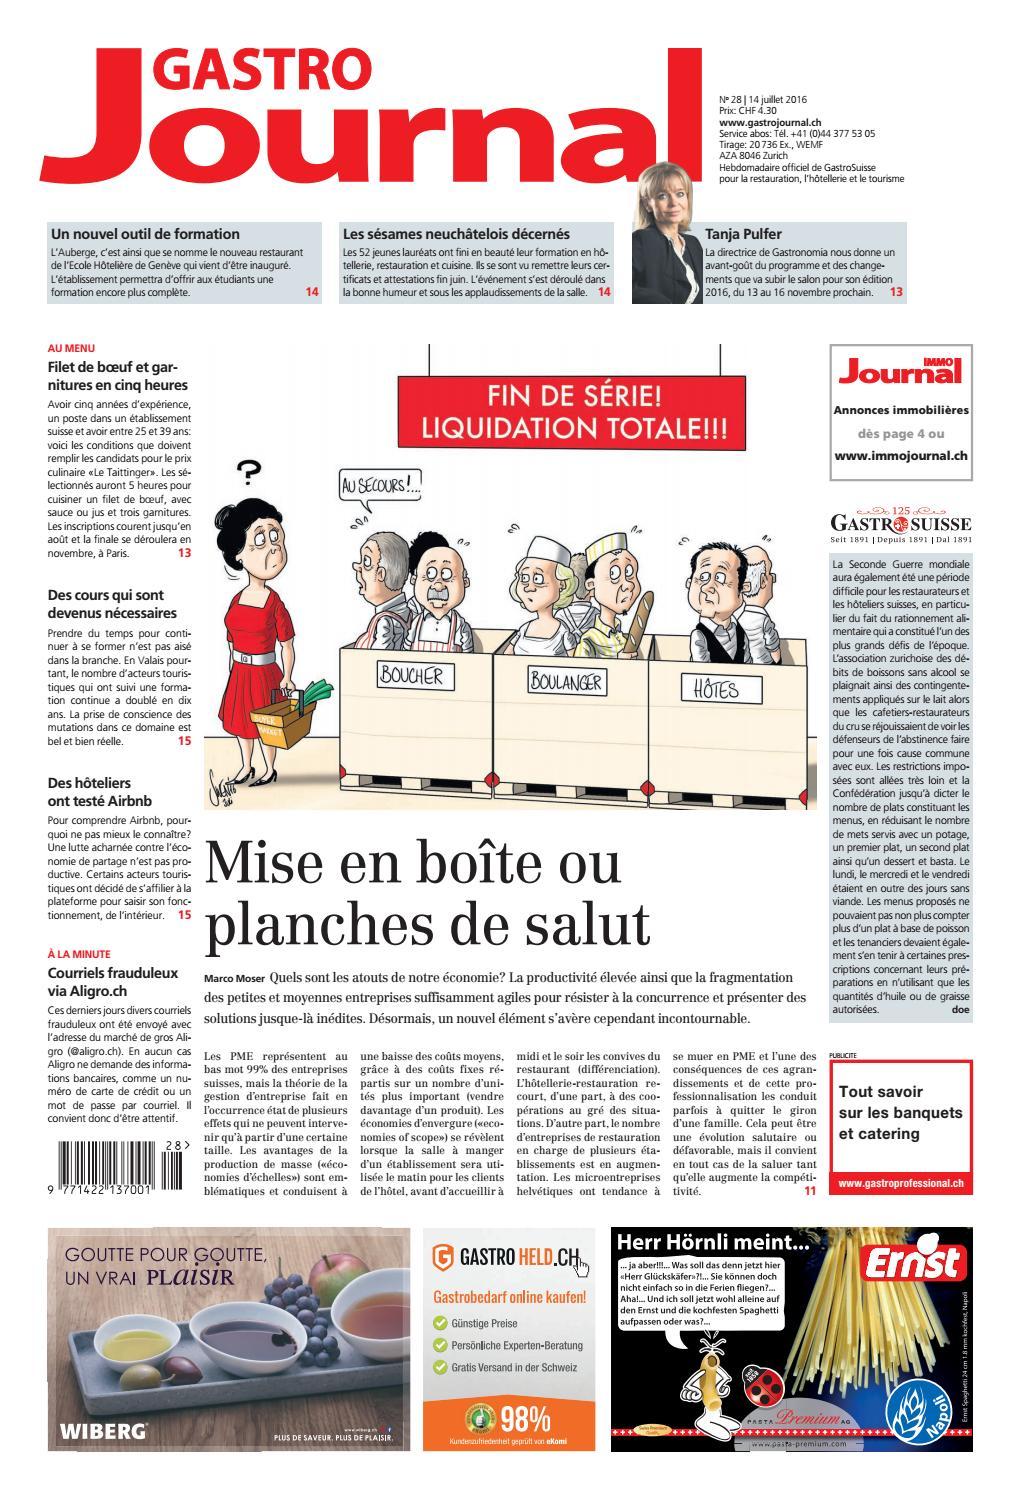 GastroJournal 28/2016 by Gastrojournal - issuu